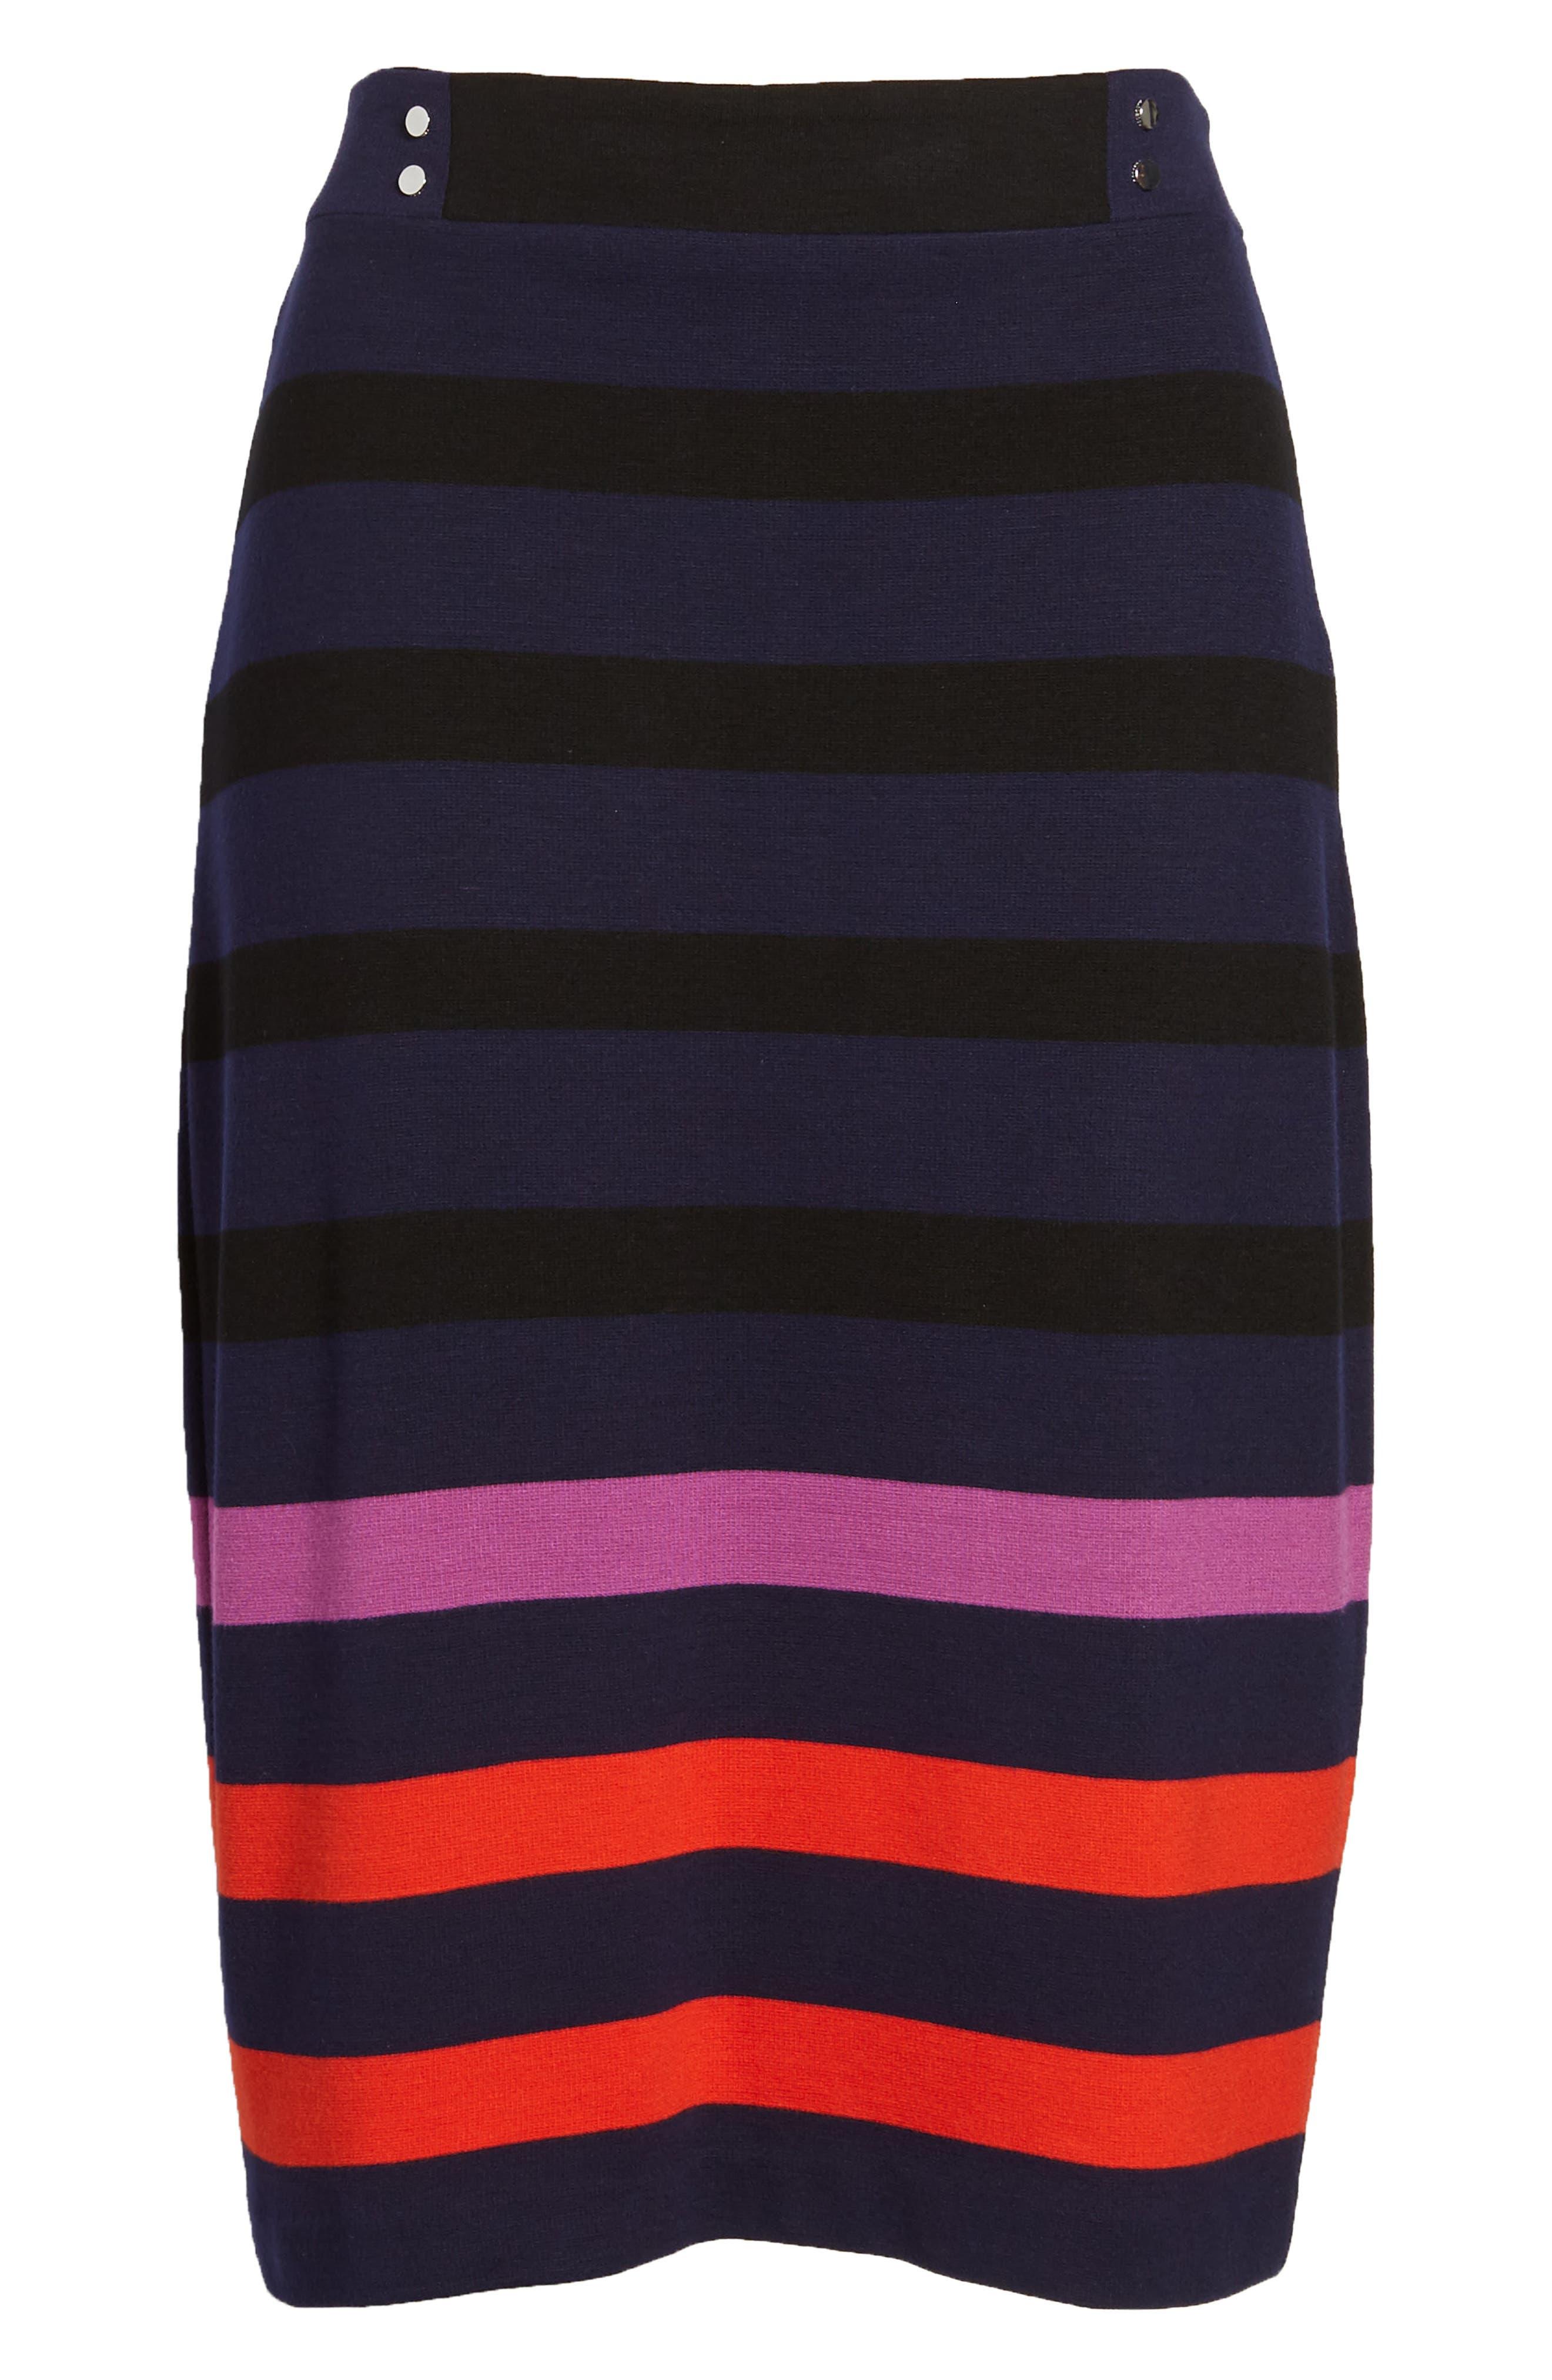 Ebienne Stripe Pencil Skirt,                             Alternate thumbnail 7, color,                             Nautical Blue Fantasy